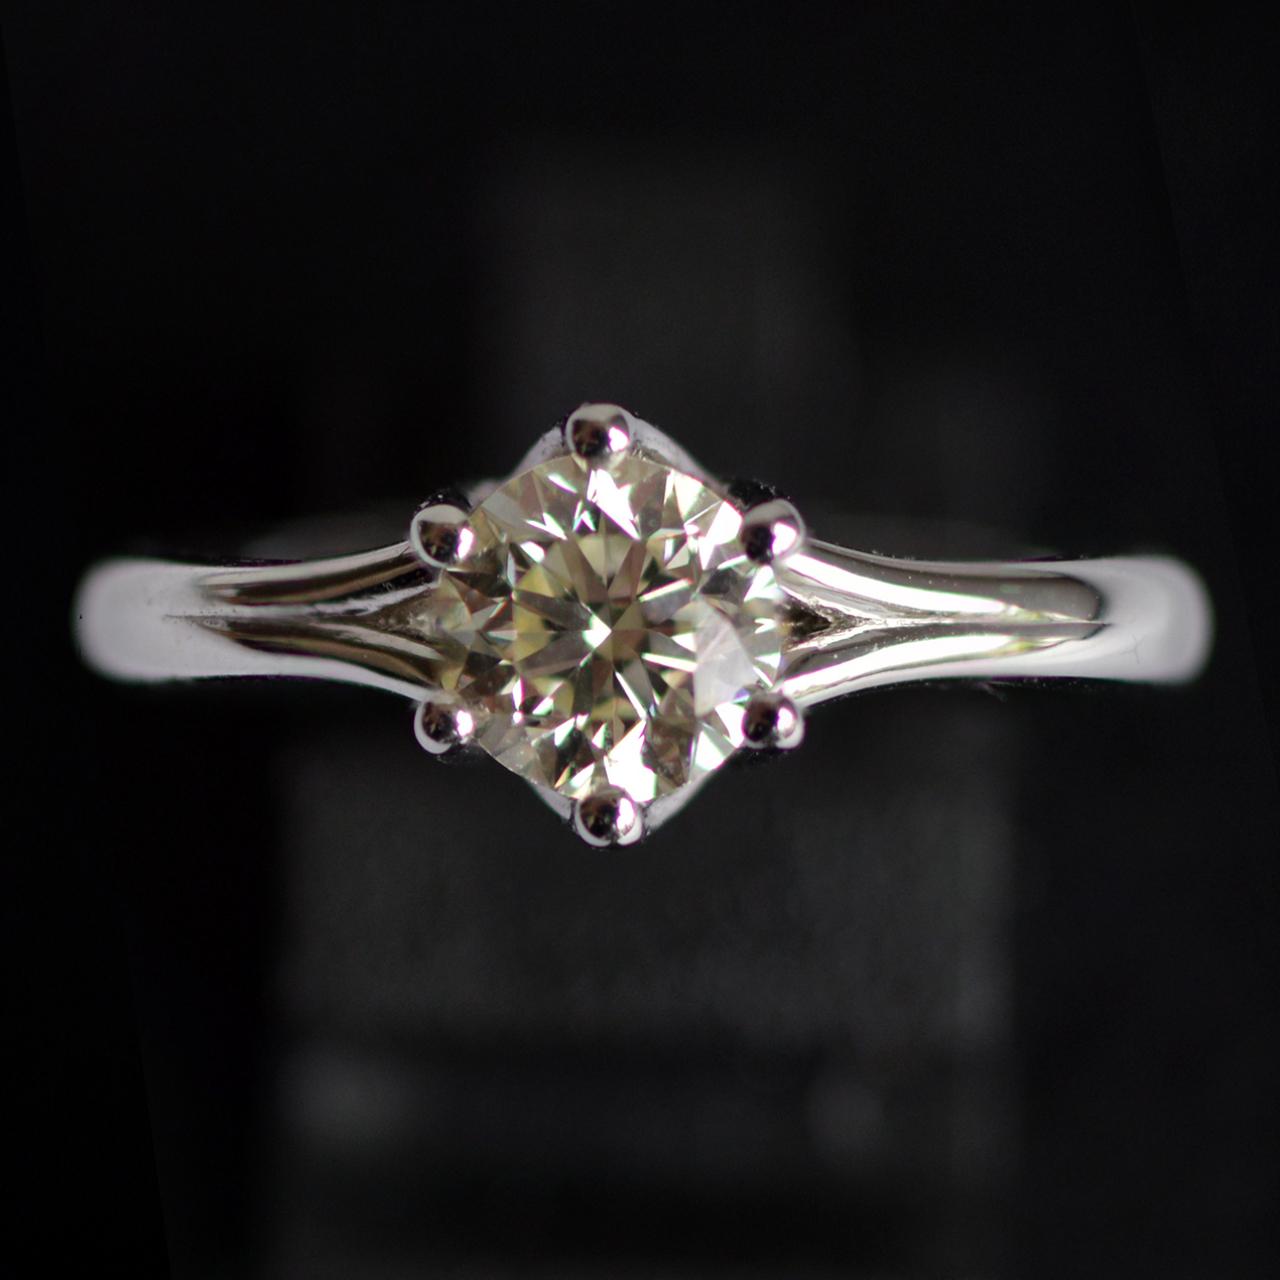 2lips-de-mooiste-verlovingsring-1-09-crt-vs1-solitair-diamant-designer-david-aardewerk-juwelier